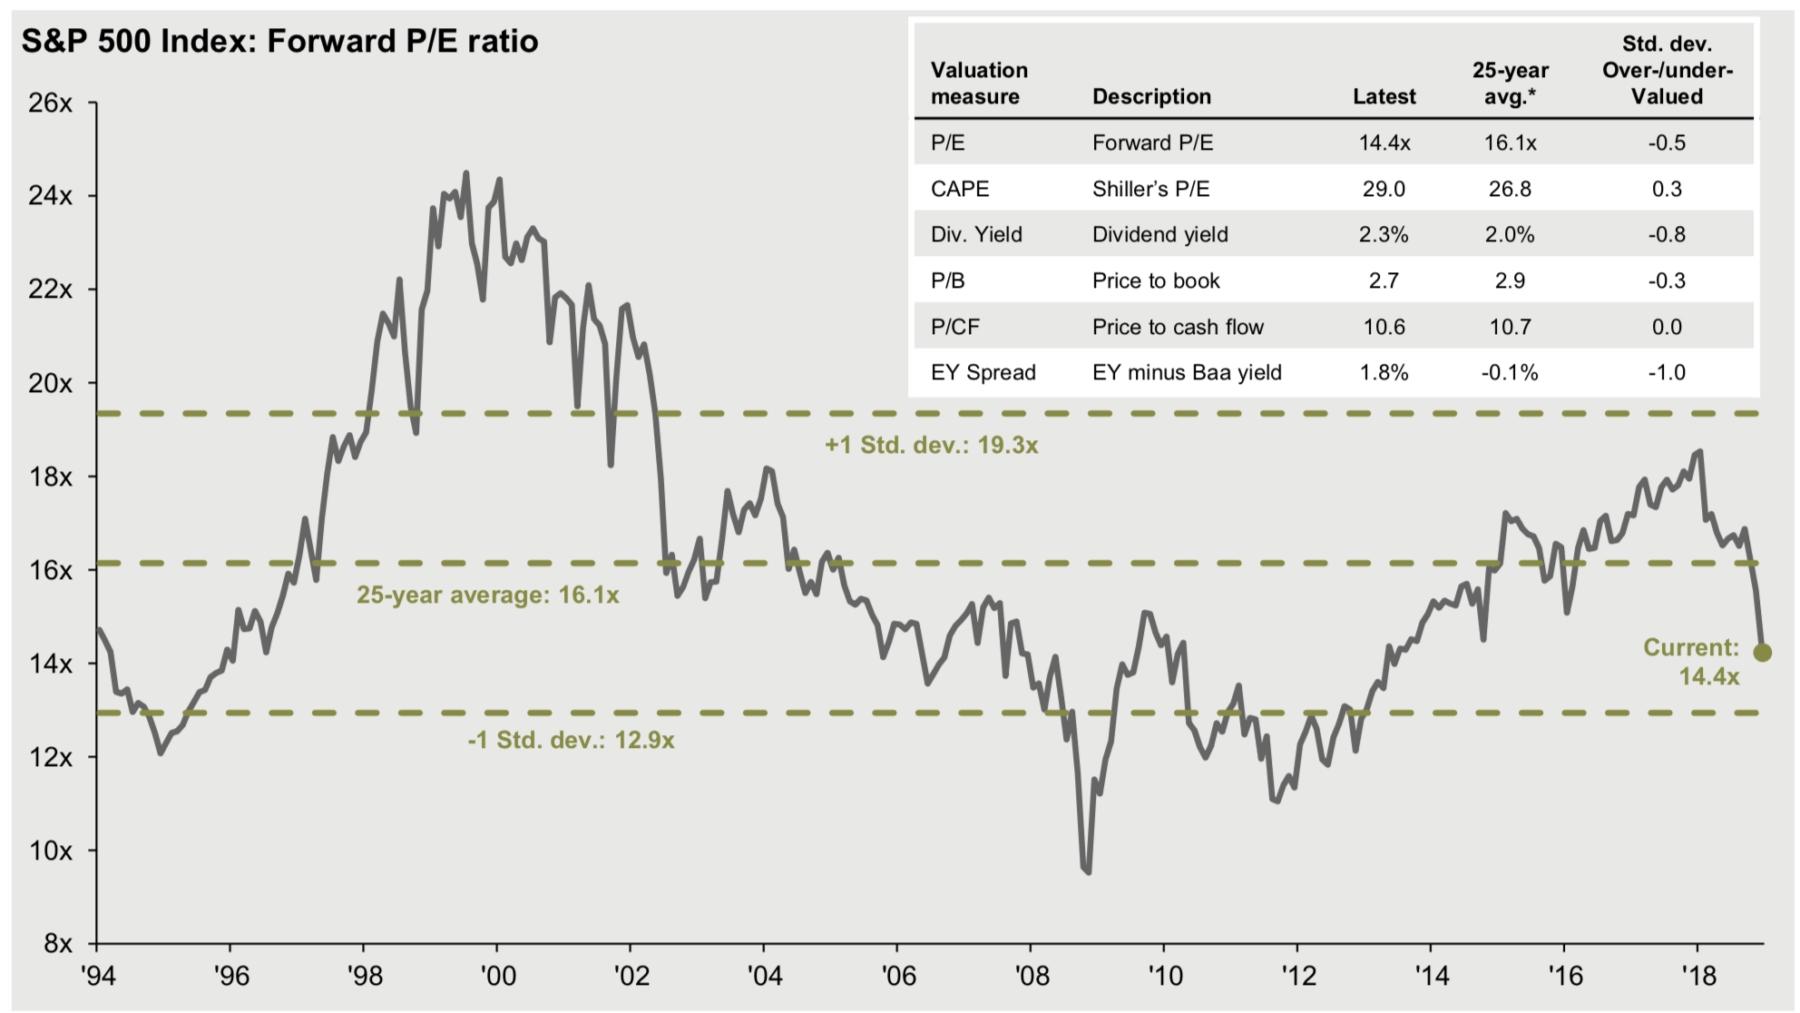 S&p 500 Index: Forward P/e Ratio - The Big Picture